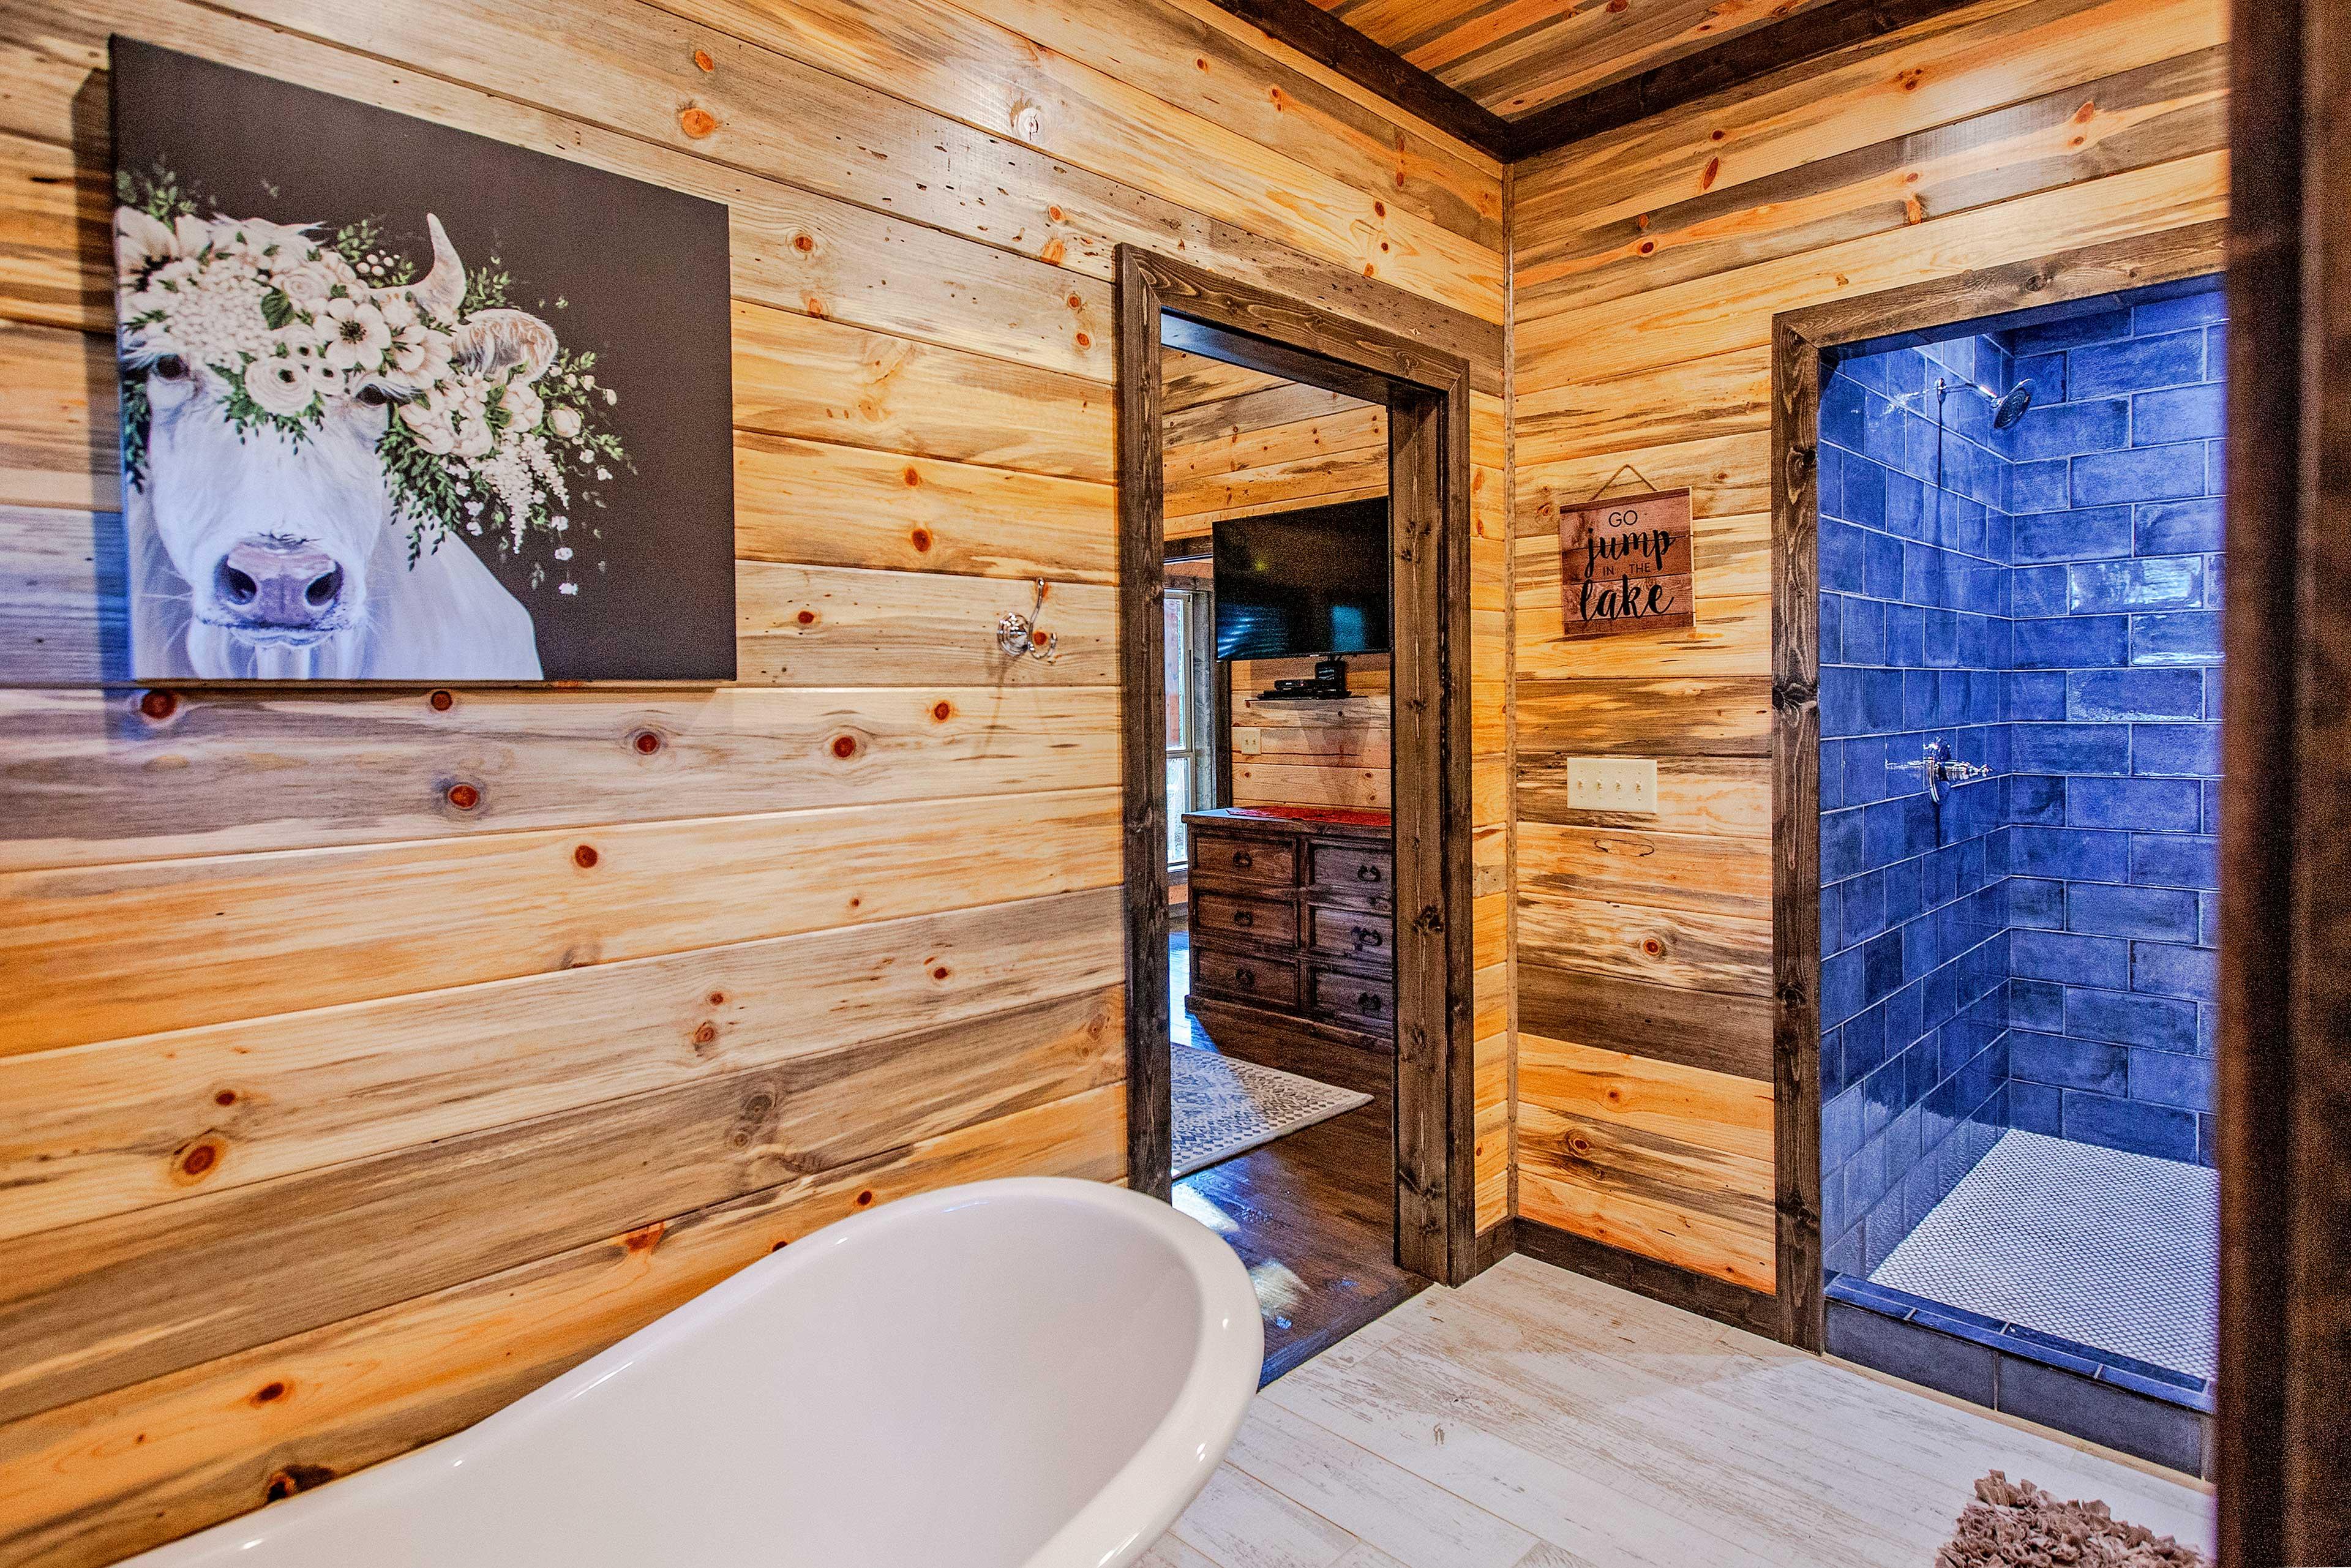 Contemporary Western-inspired artwork adorns the bathroom walls.